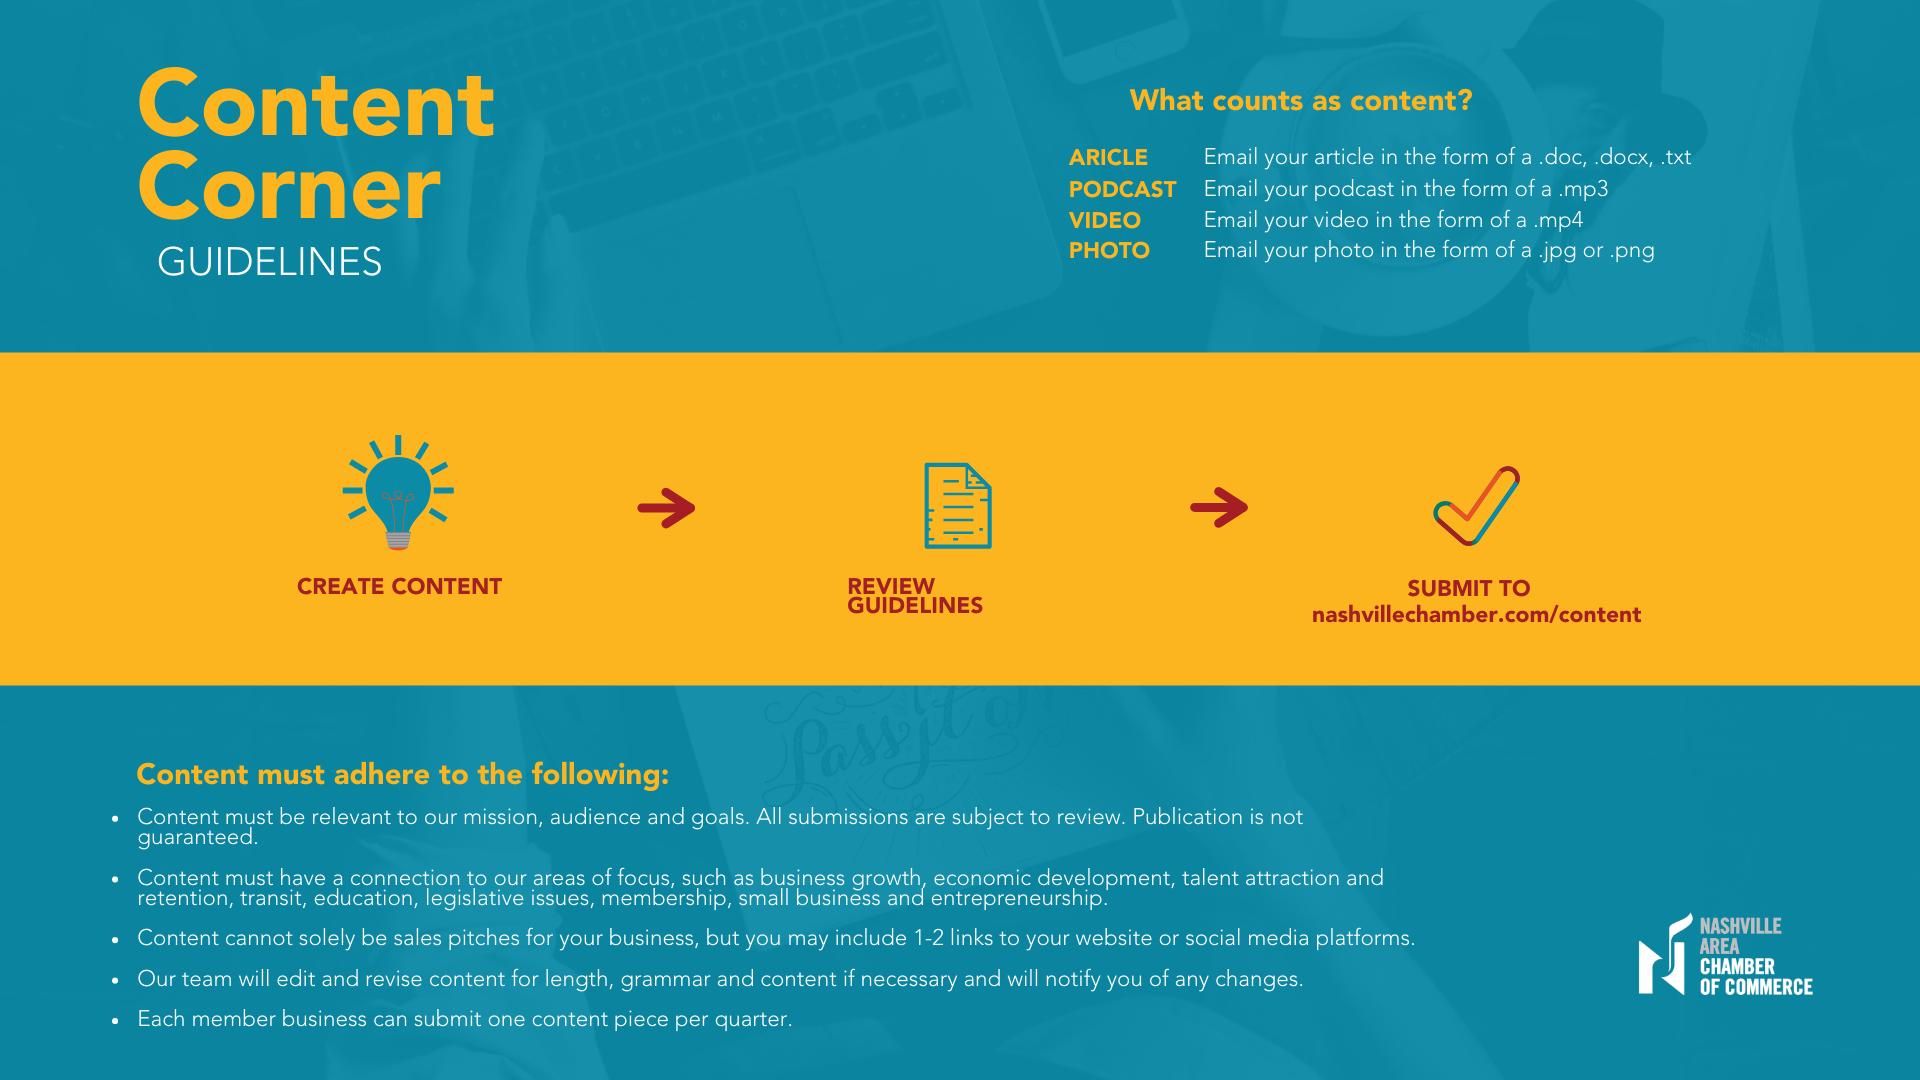 Content Corner Guidelines